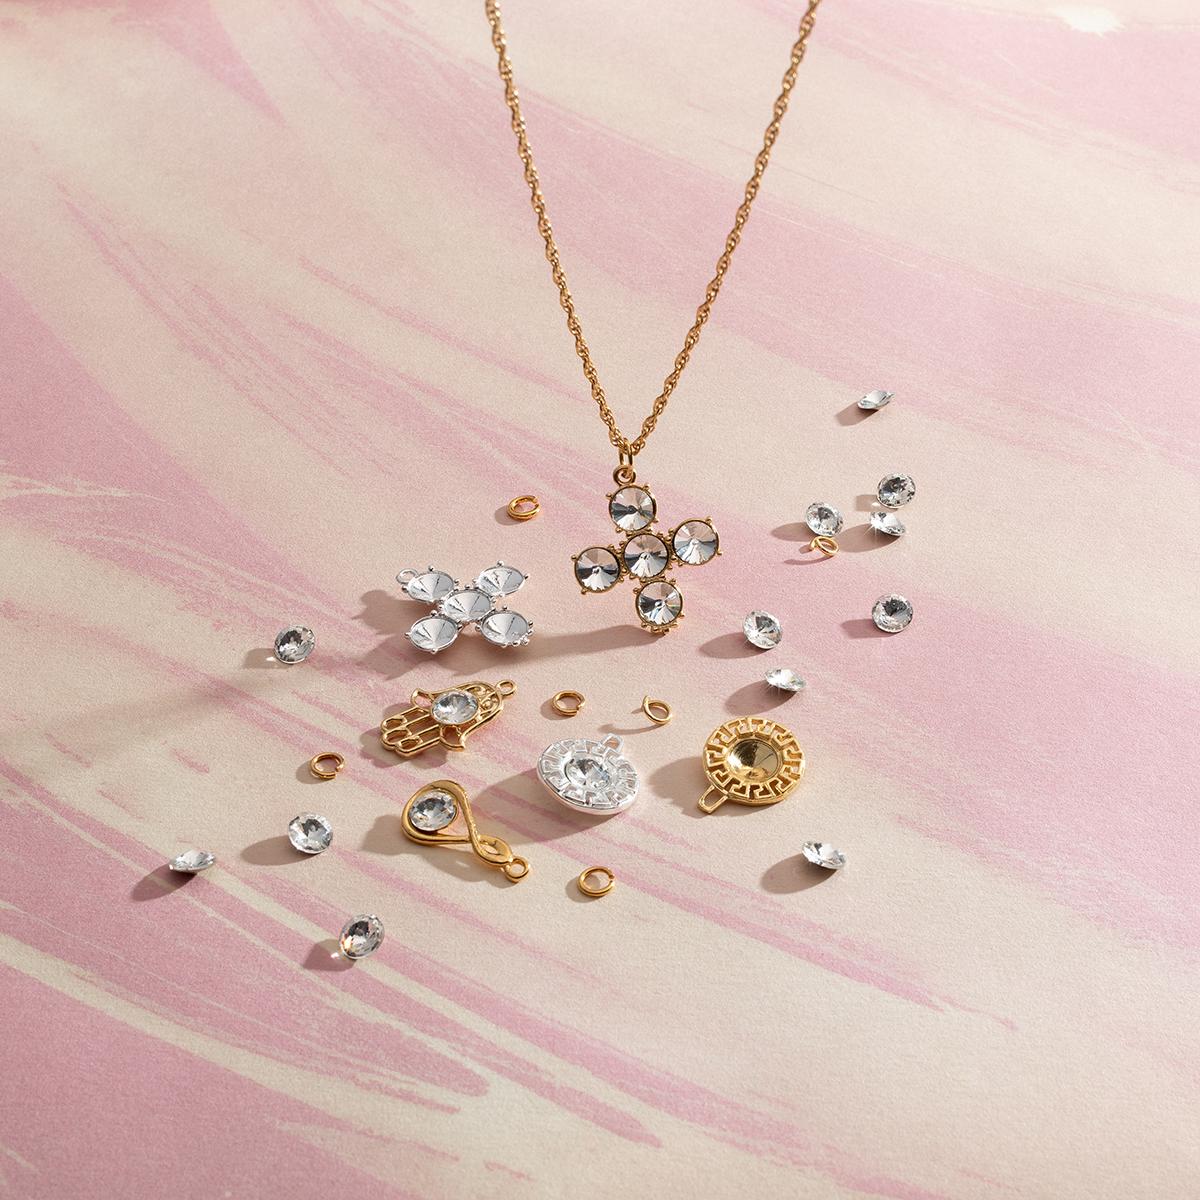 rivoli crystals jewelry